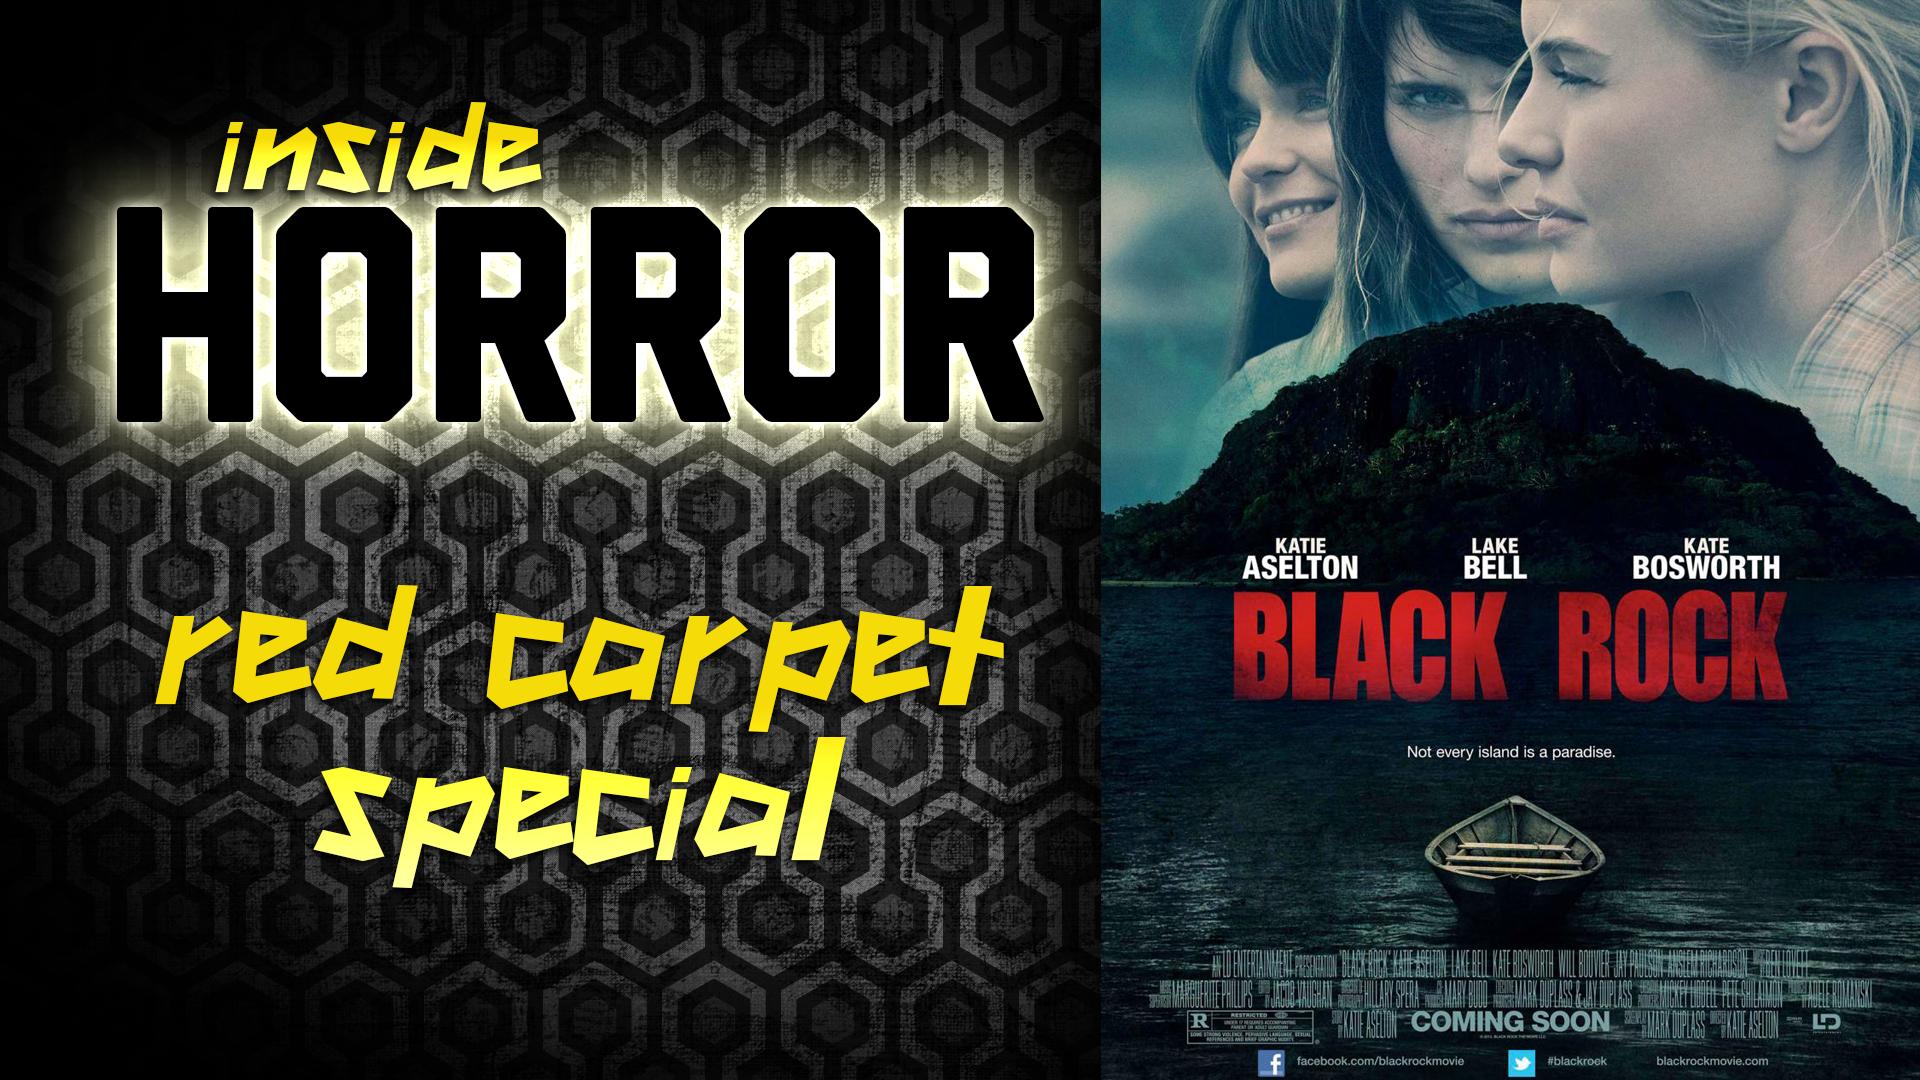 BLACK ROCK Red Carpet Special – Inside Horror